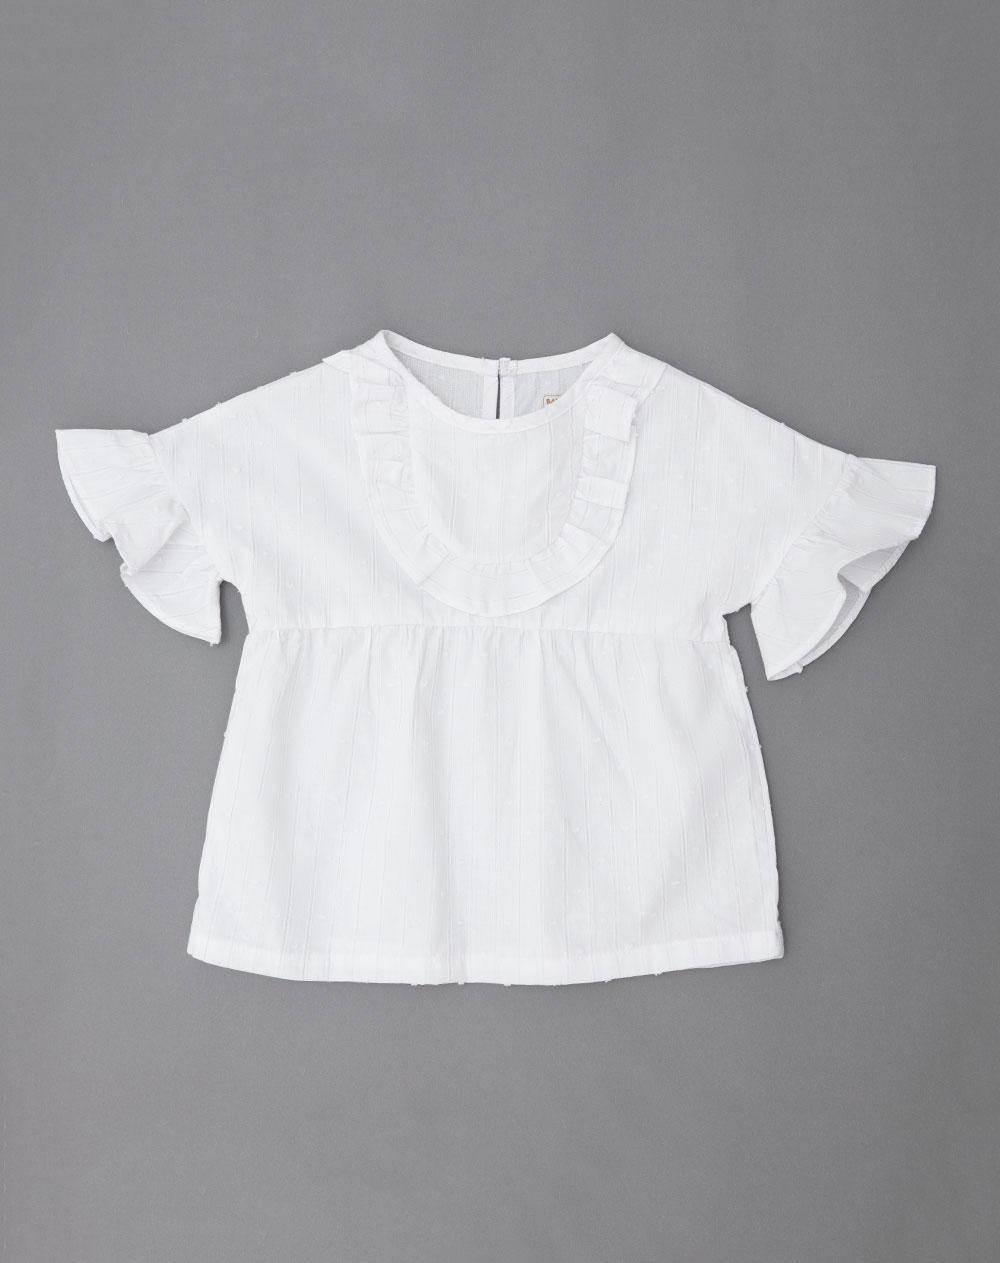 8b6a5a498 Camisa para Bebé Niño Bafe Blanca Baby Fresh